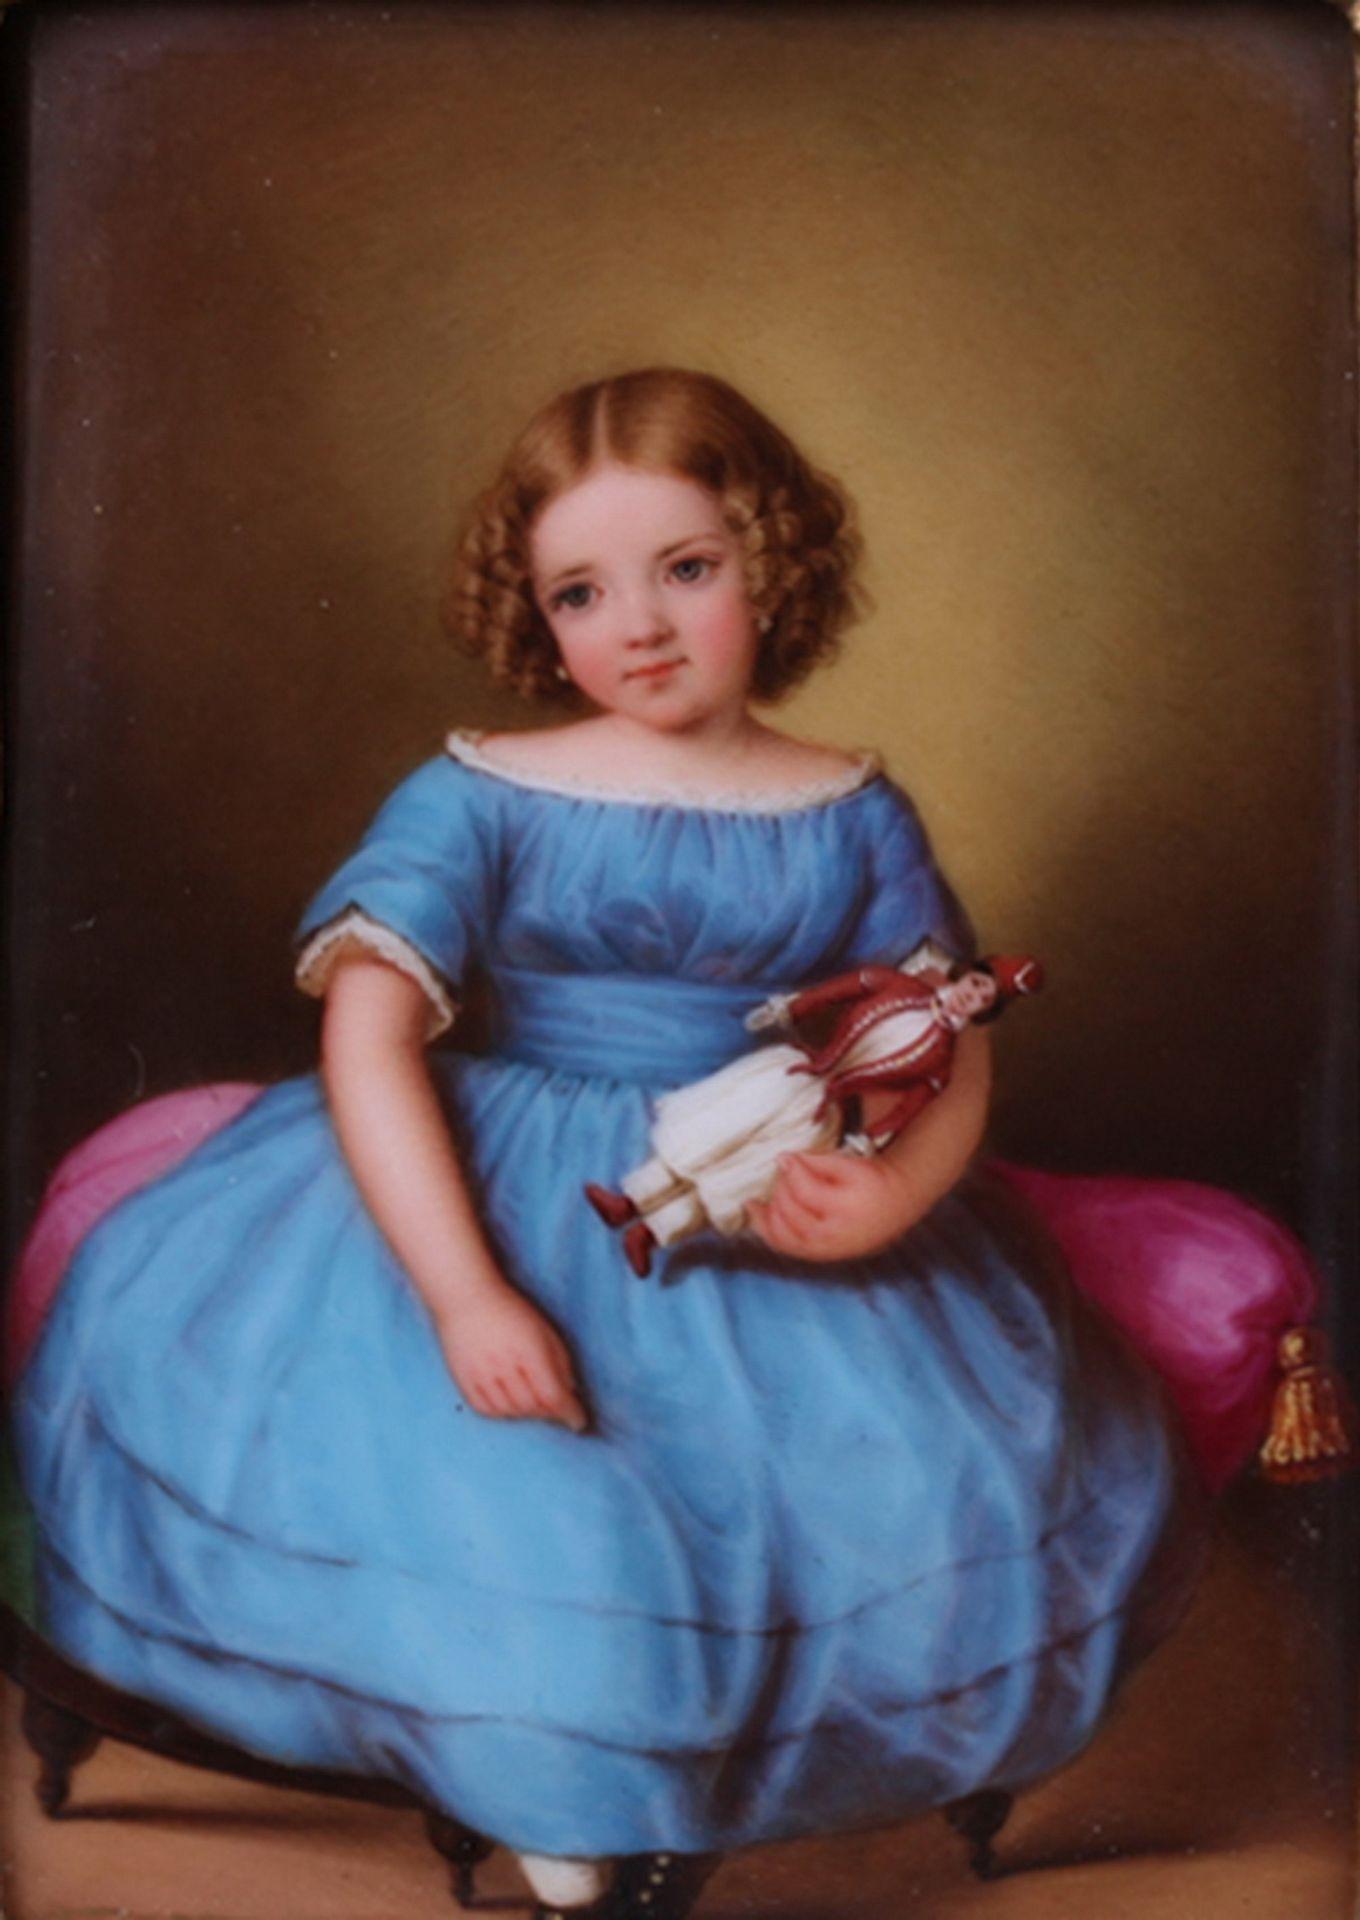 Hoffmann, E. Girl with a doll. Porcelain painting. 1853. 10,7x7,5 cm.<br>Framed. Artist's sign and d - Bild 2 aus 4